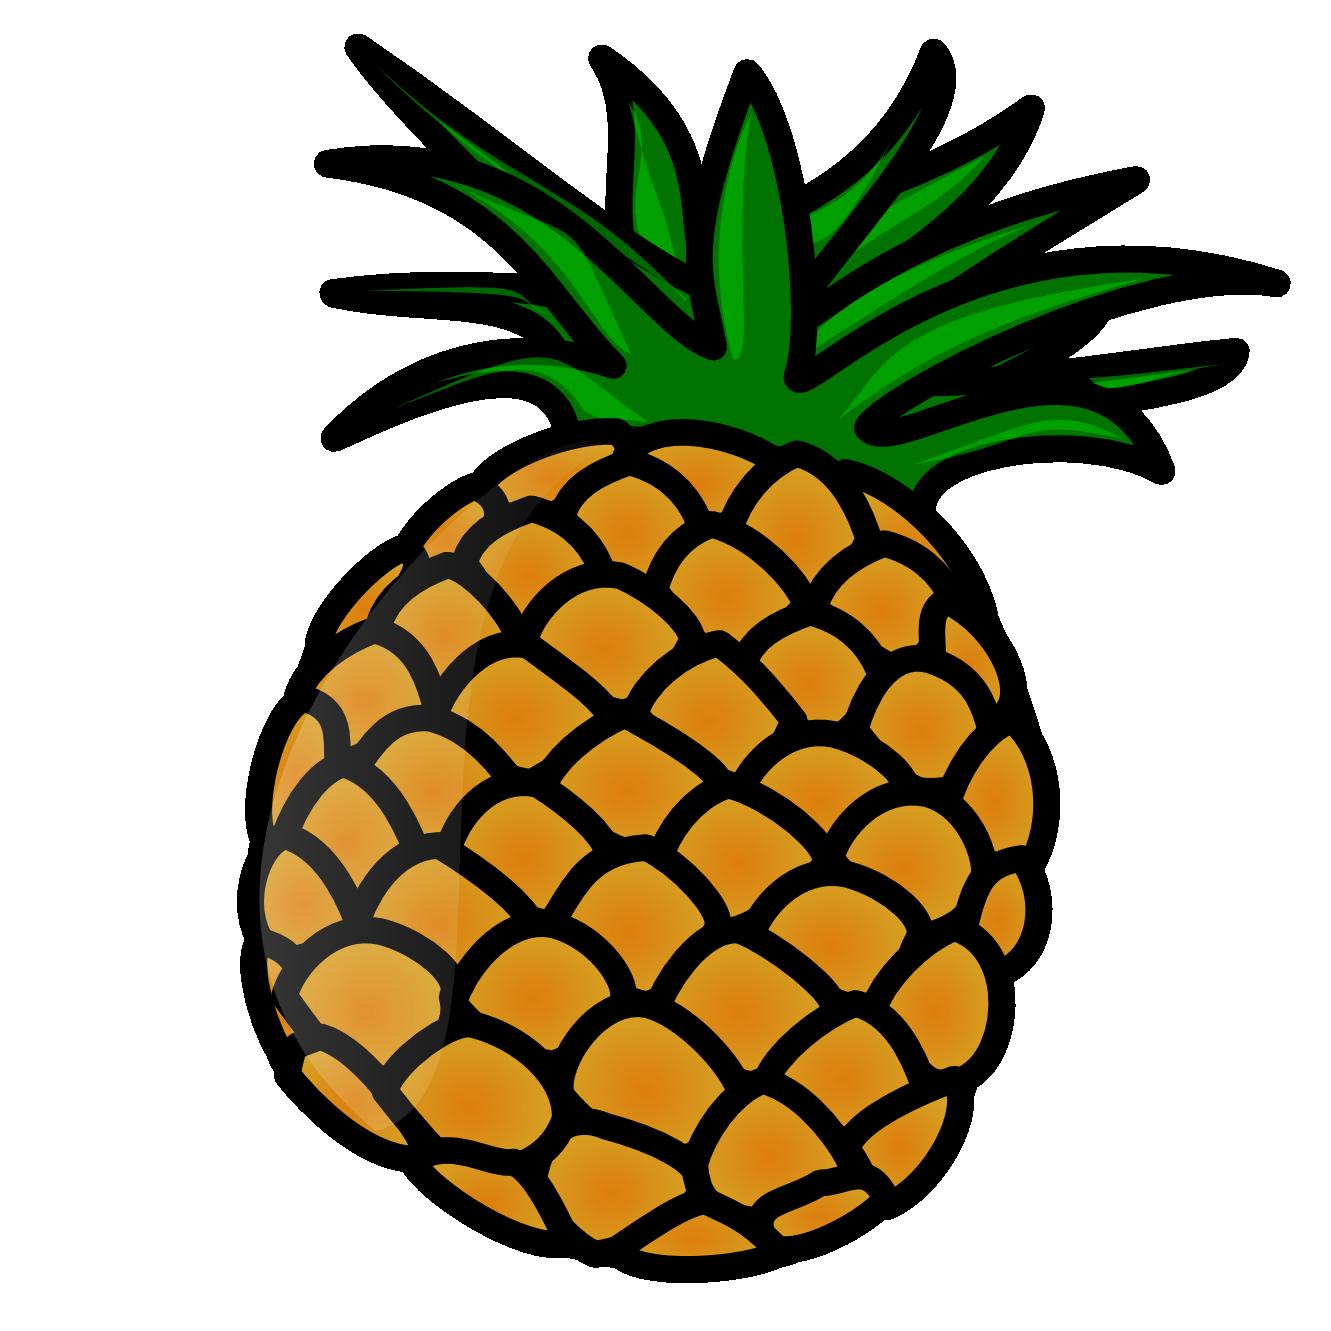 Pineapple clipart. Clip art free panda